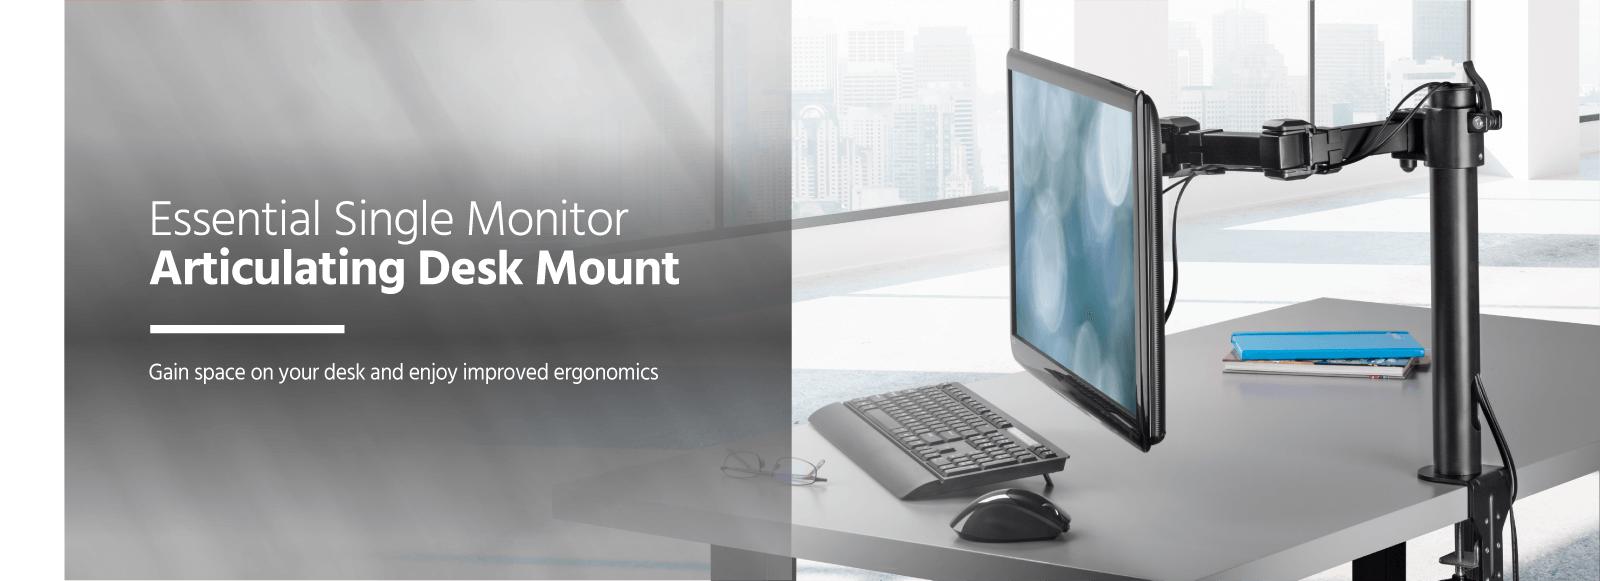 Fabulous Monoprice Essential Single Monitor Articulating Arm Desk Download Free Architecture Designs Scobabritishbridgeorg